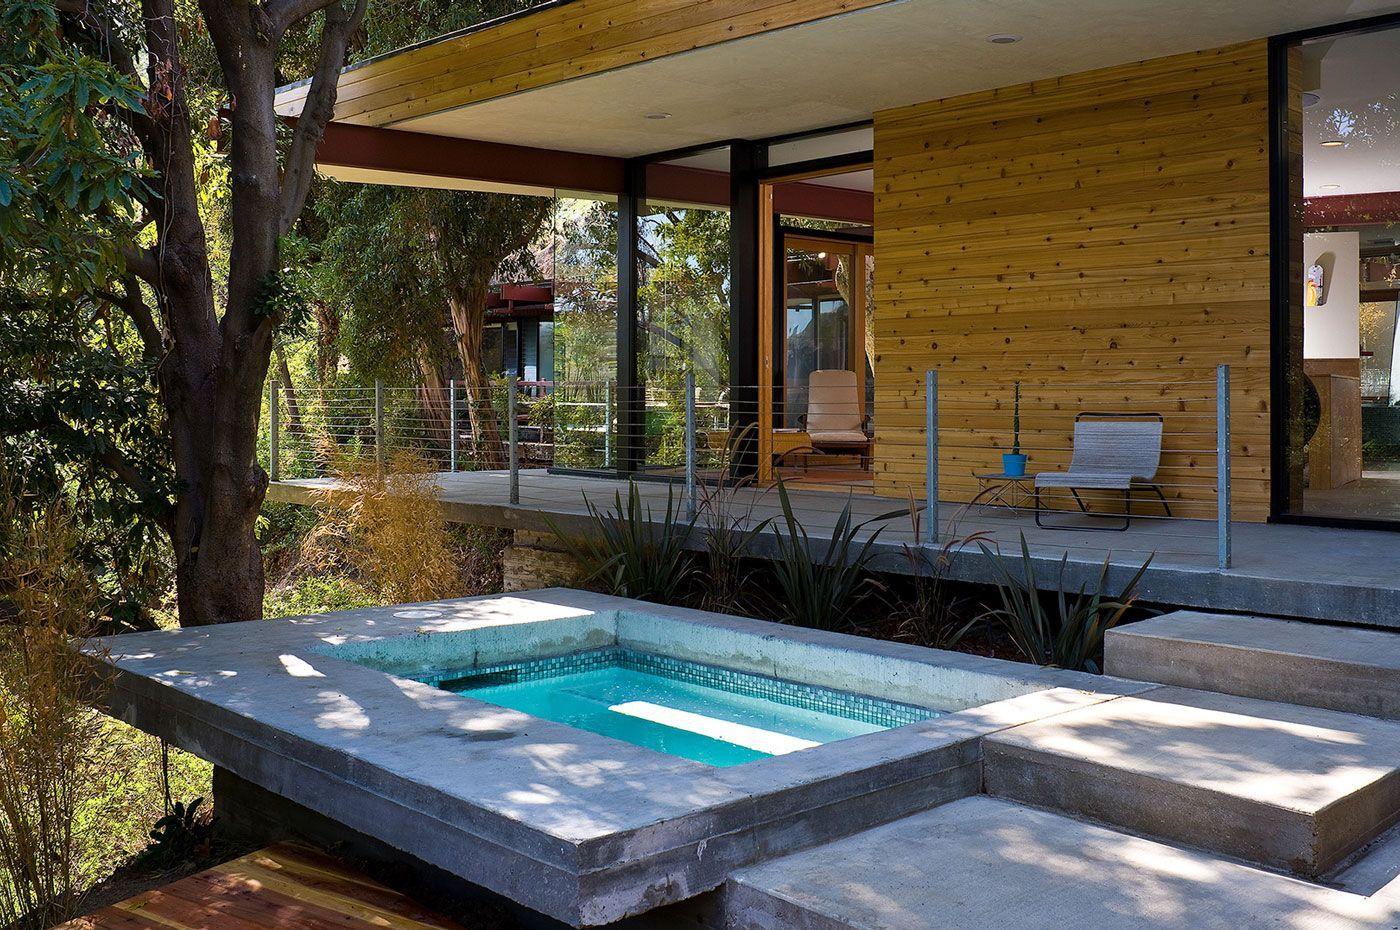 small pool on the terrace Cerca con Google